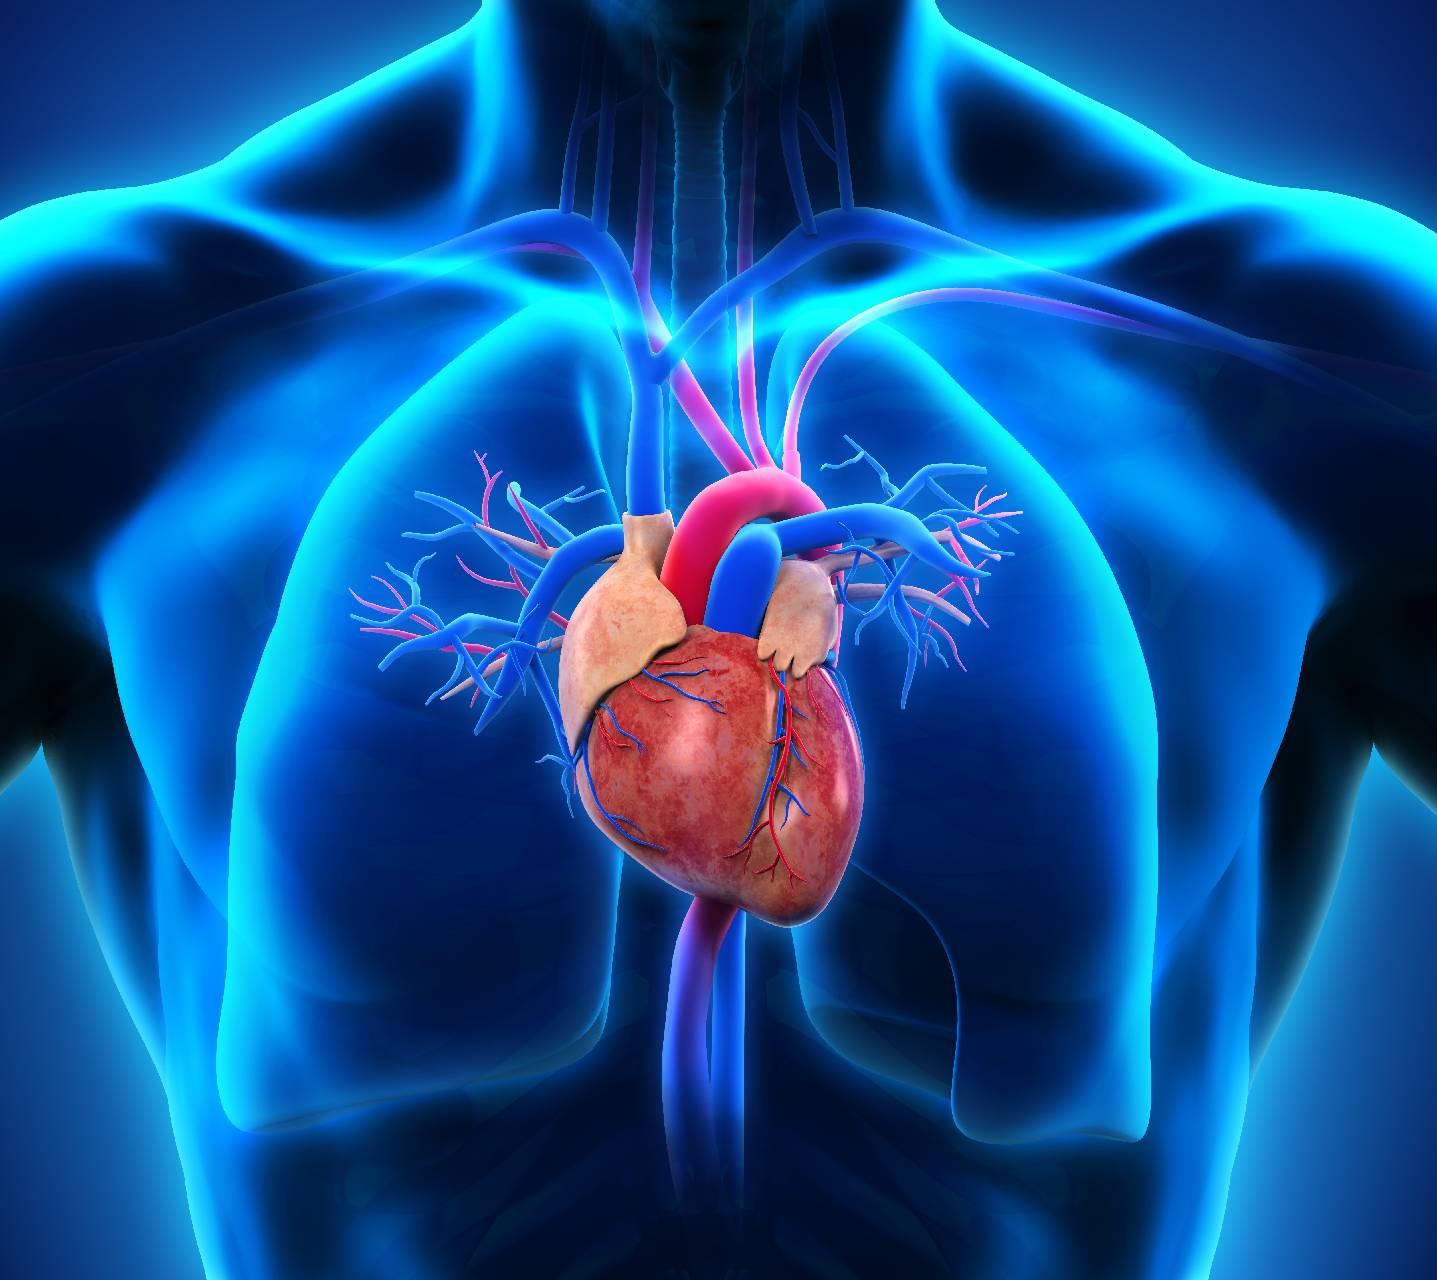 Human Heart Wallpapers - Top Free Human Heart Backgrounds ...